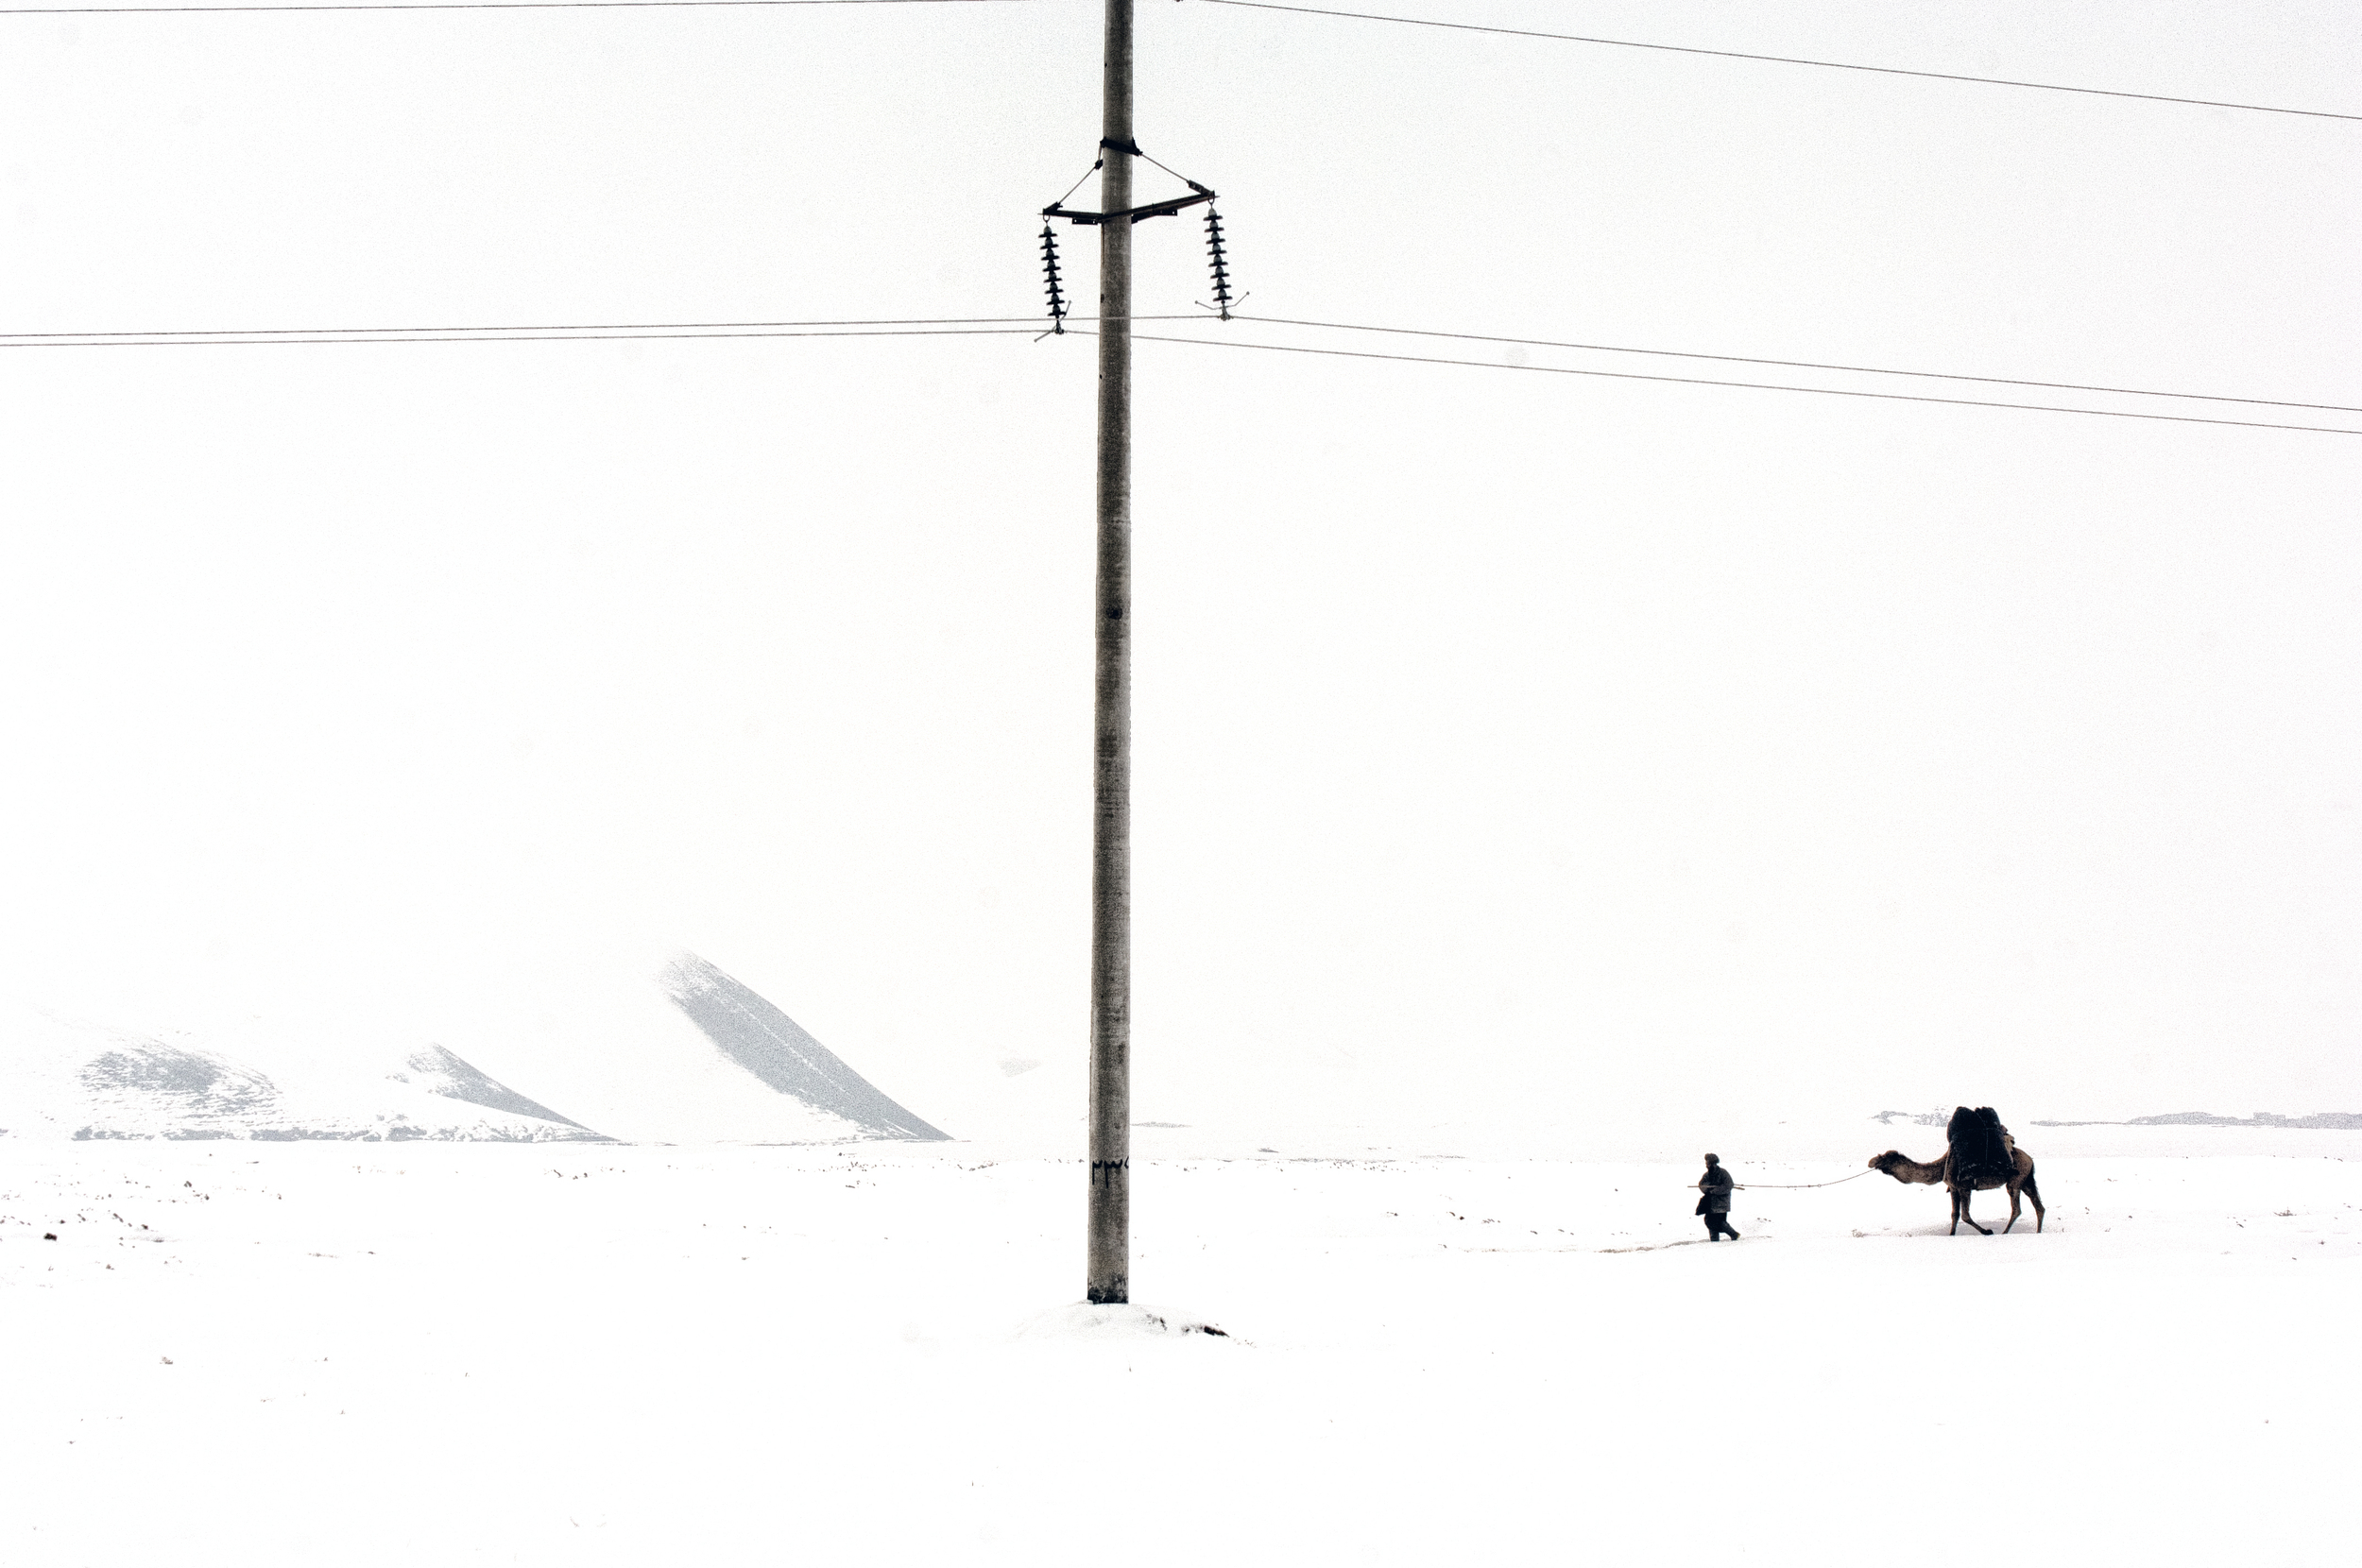 Jowzjan Province, Afghanistan, February 14, 2008. (Photo/Mark Pearson)